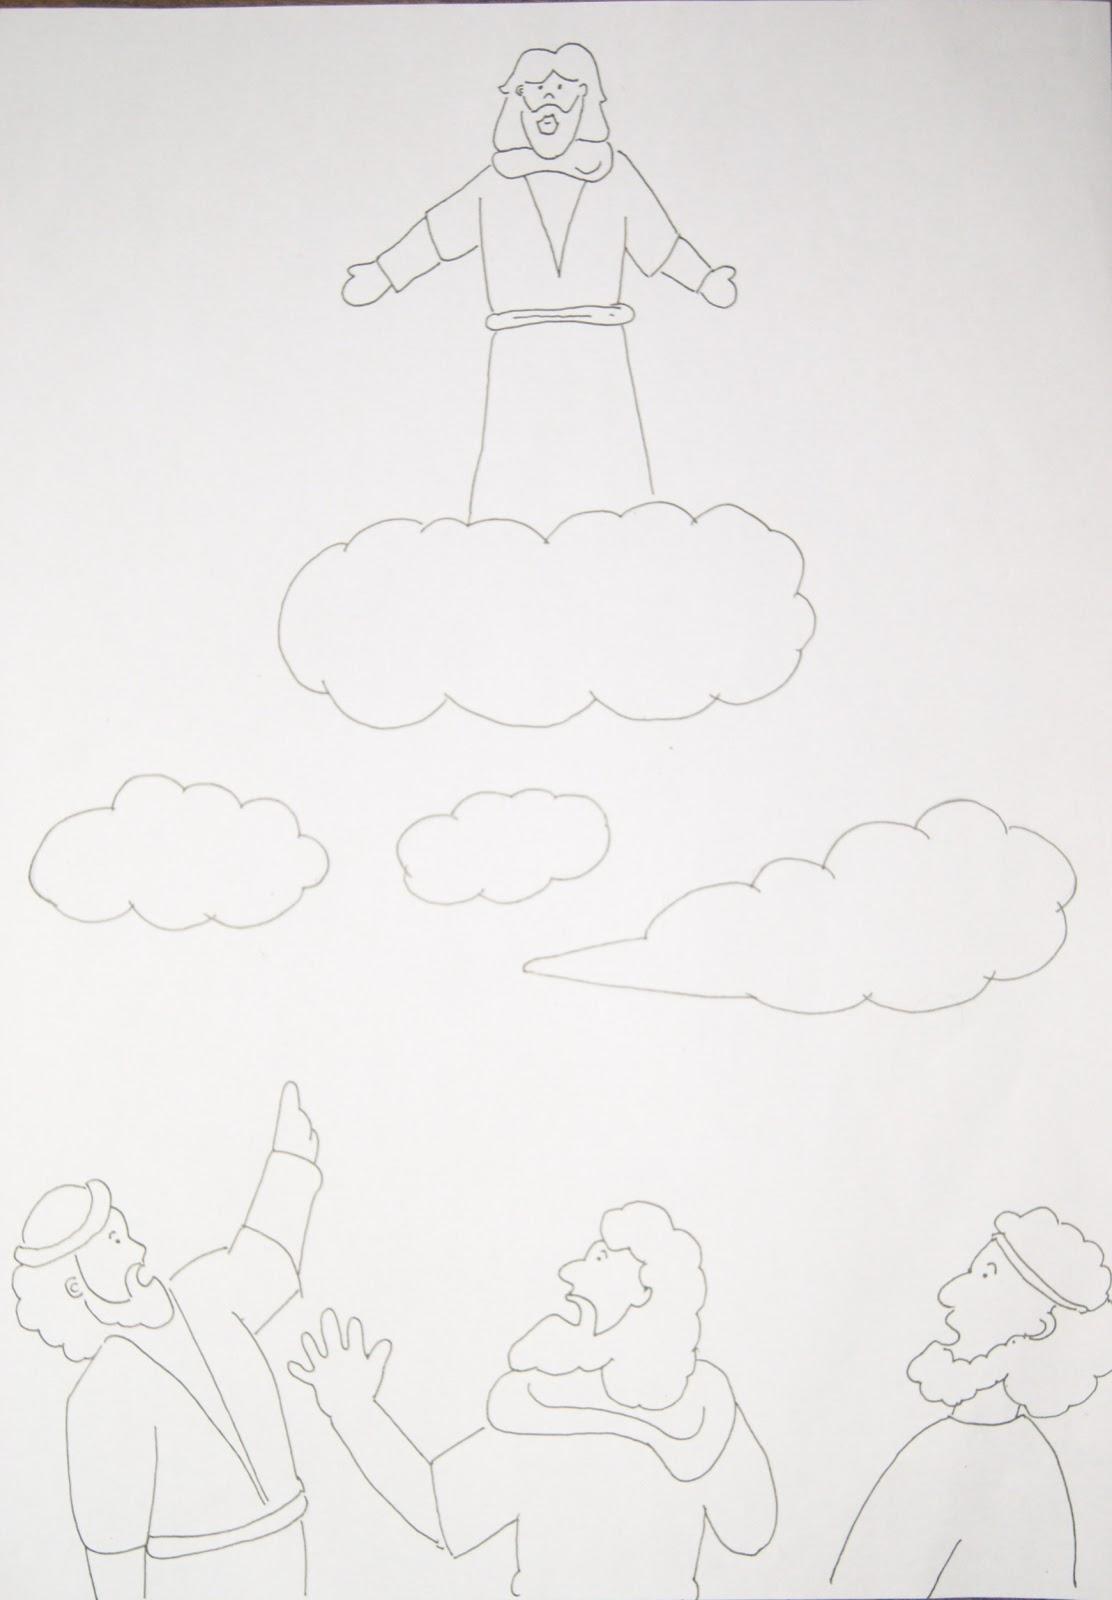 Catatan Sigal Bahan Kreativitas Sekolah Minggu 12 Mei 2013 Yesus Naik Ke Surga Pia Kumetiran